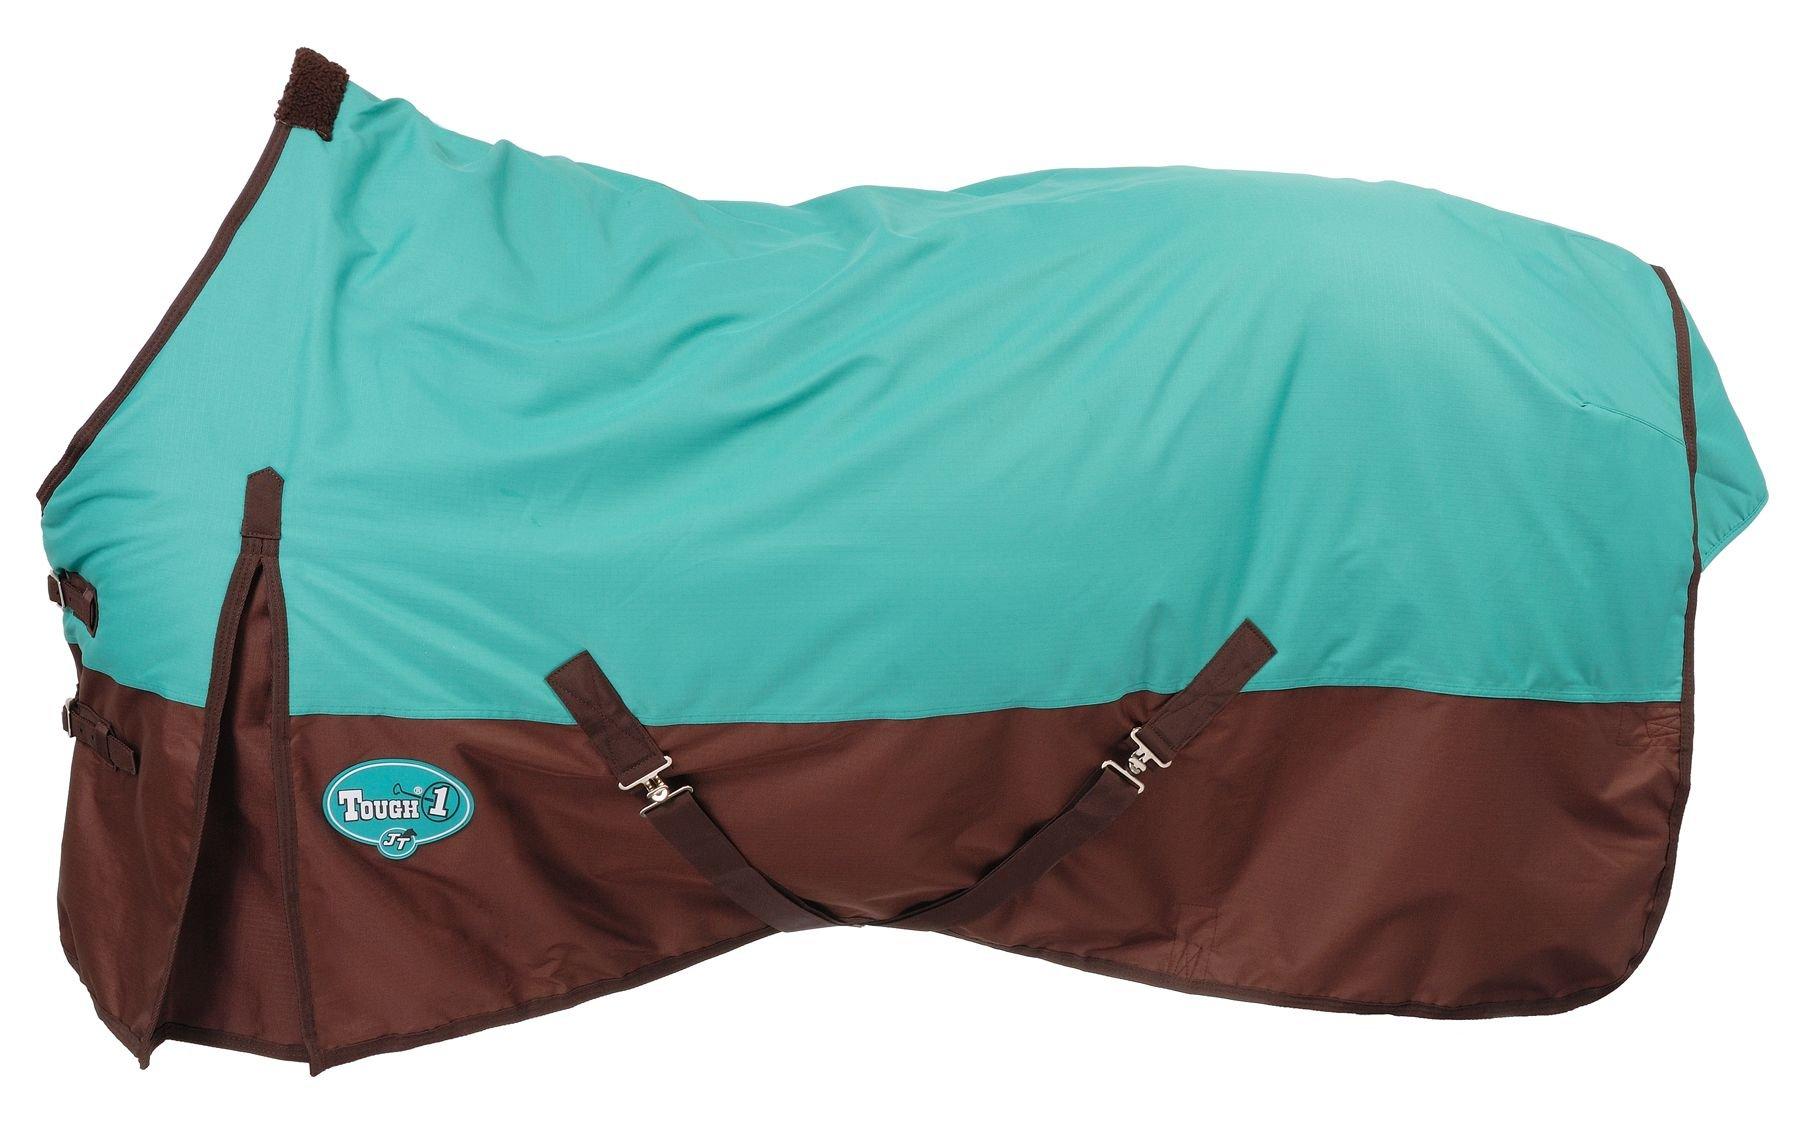 Tough 1 600 Denier Waterproof Horse Sheet, Turquoise/Brown, 84-Inch